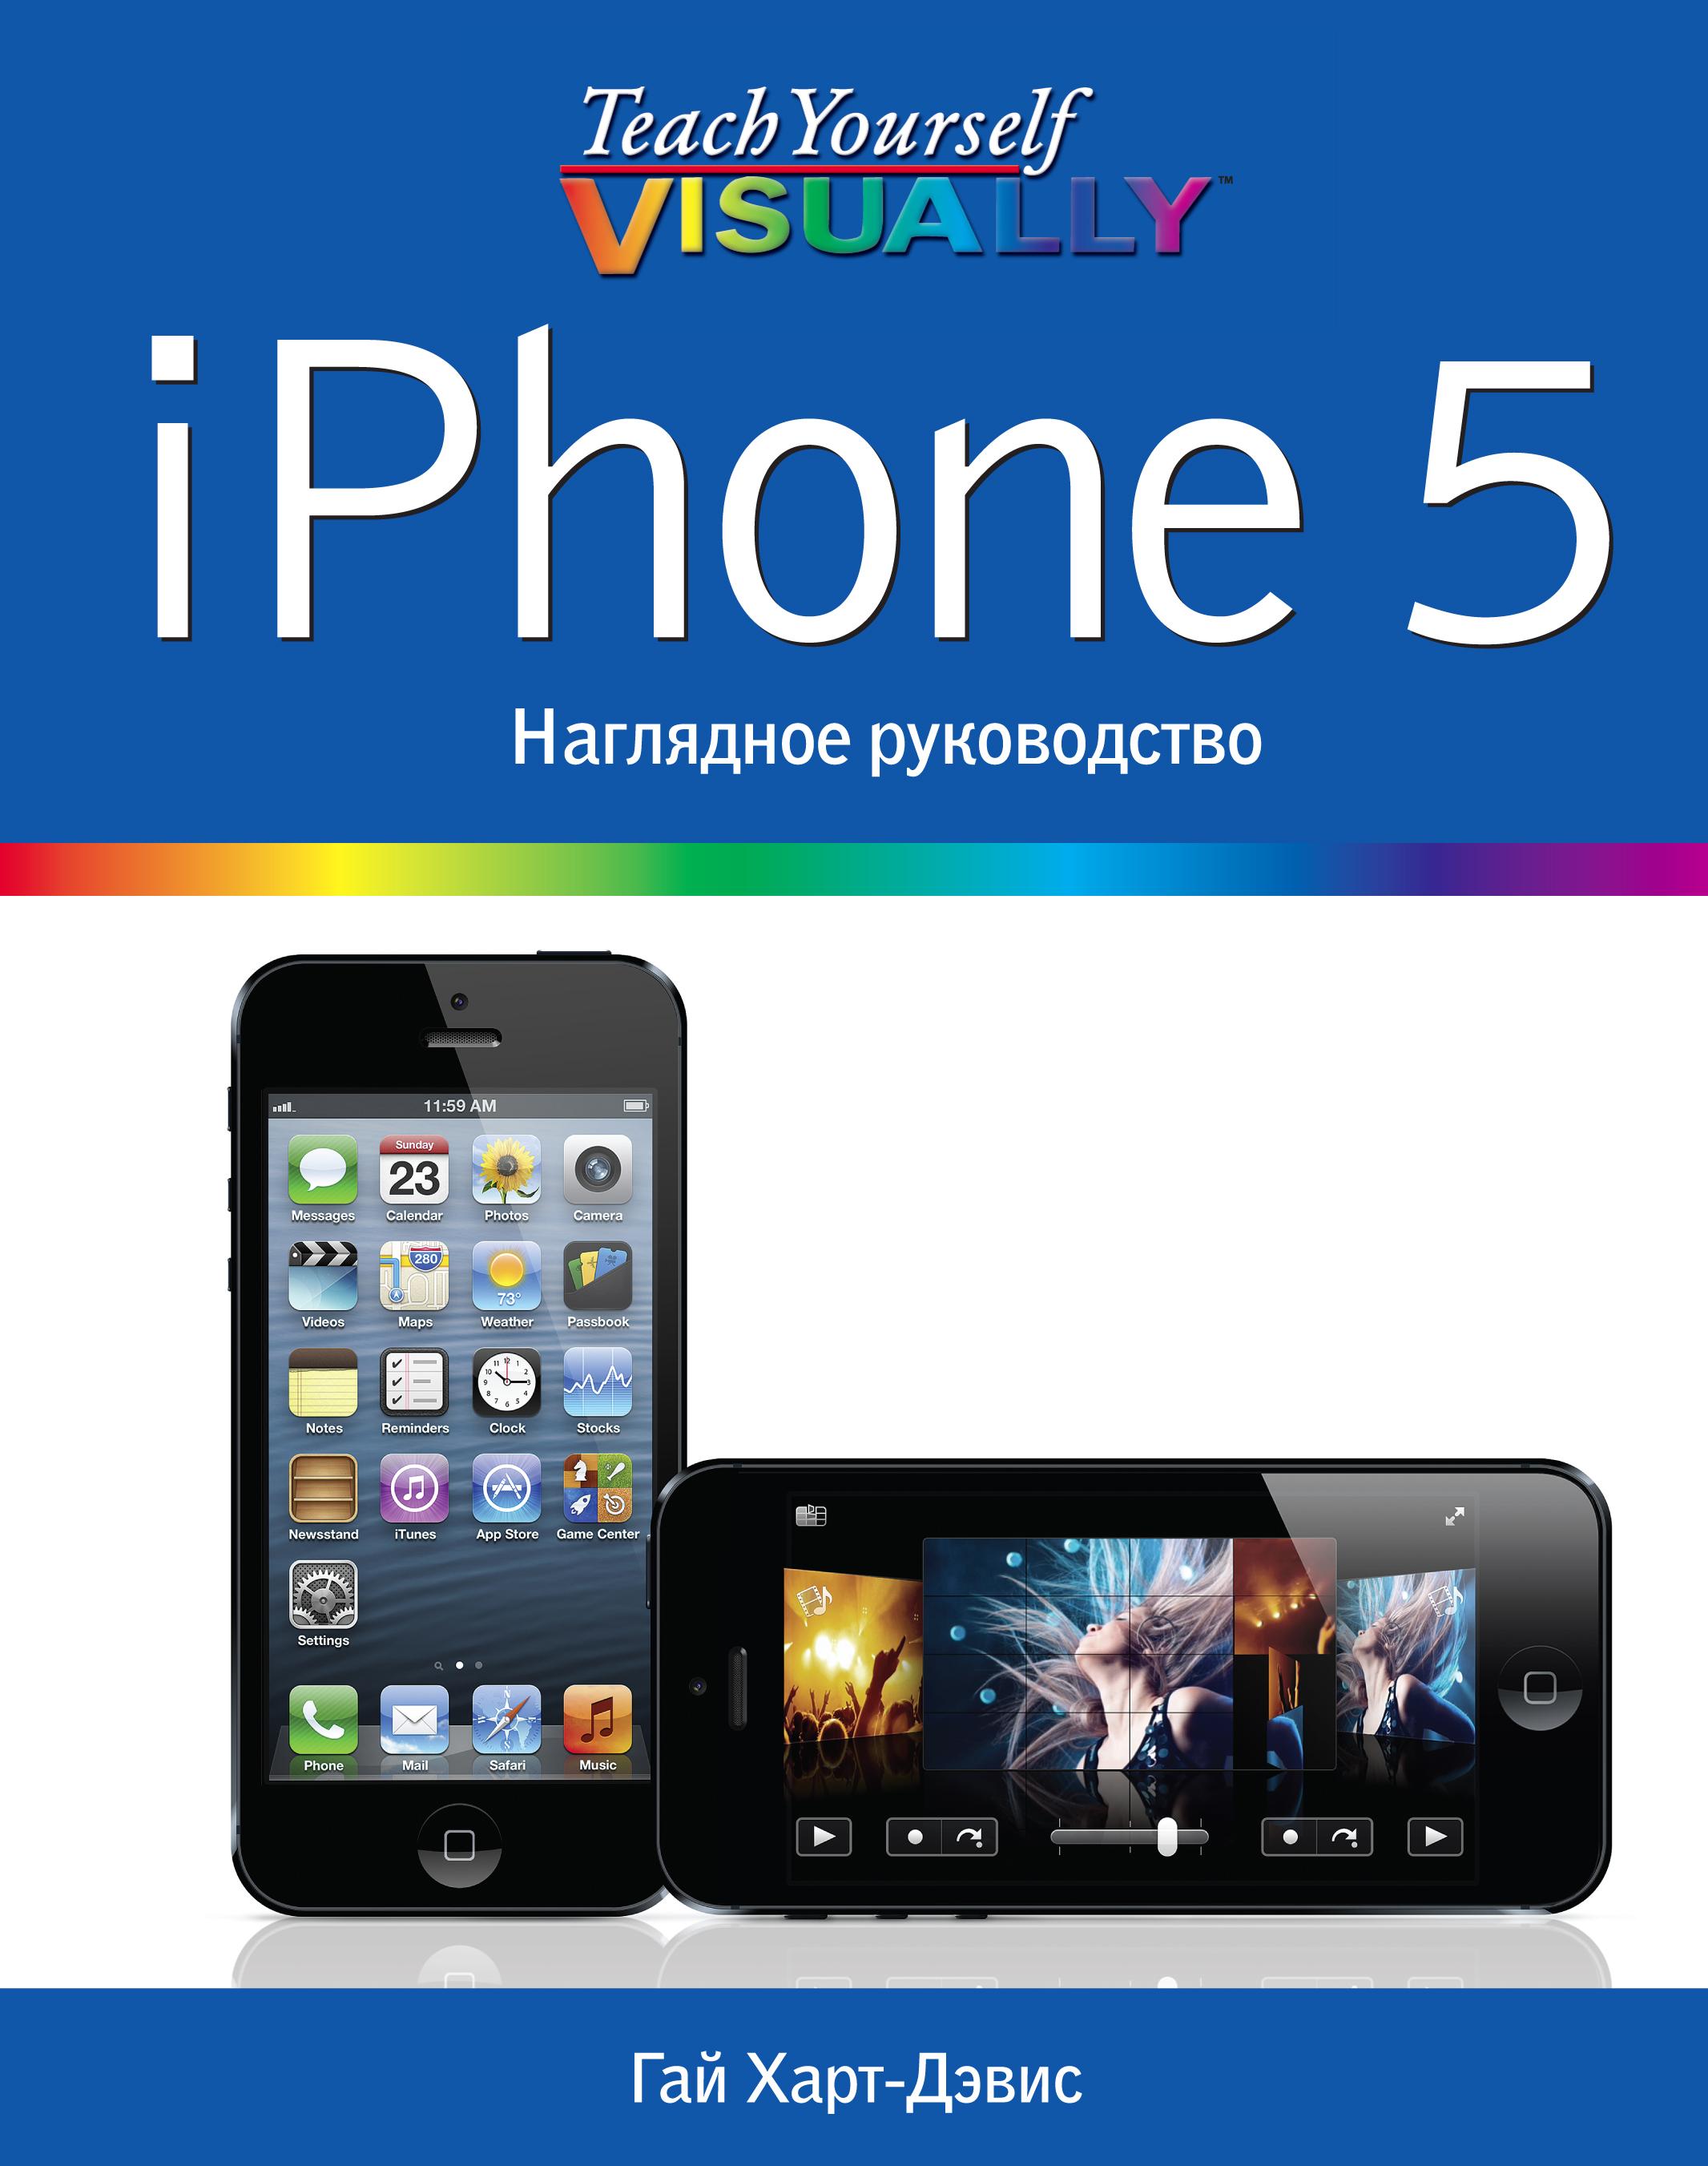 Харт-Дэвис Г. iPhone 5. Наглядное руководство